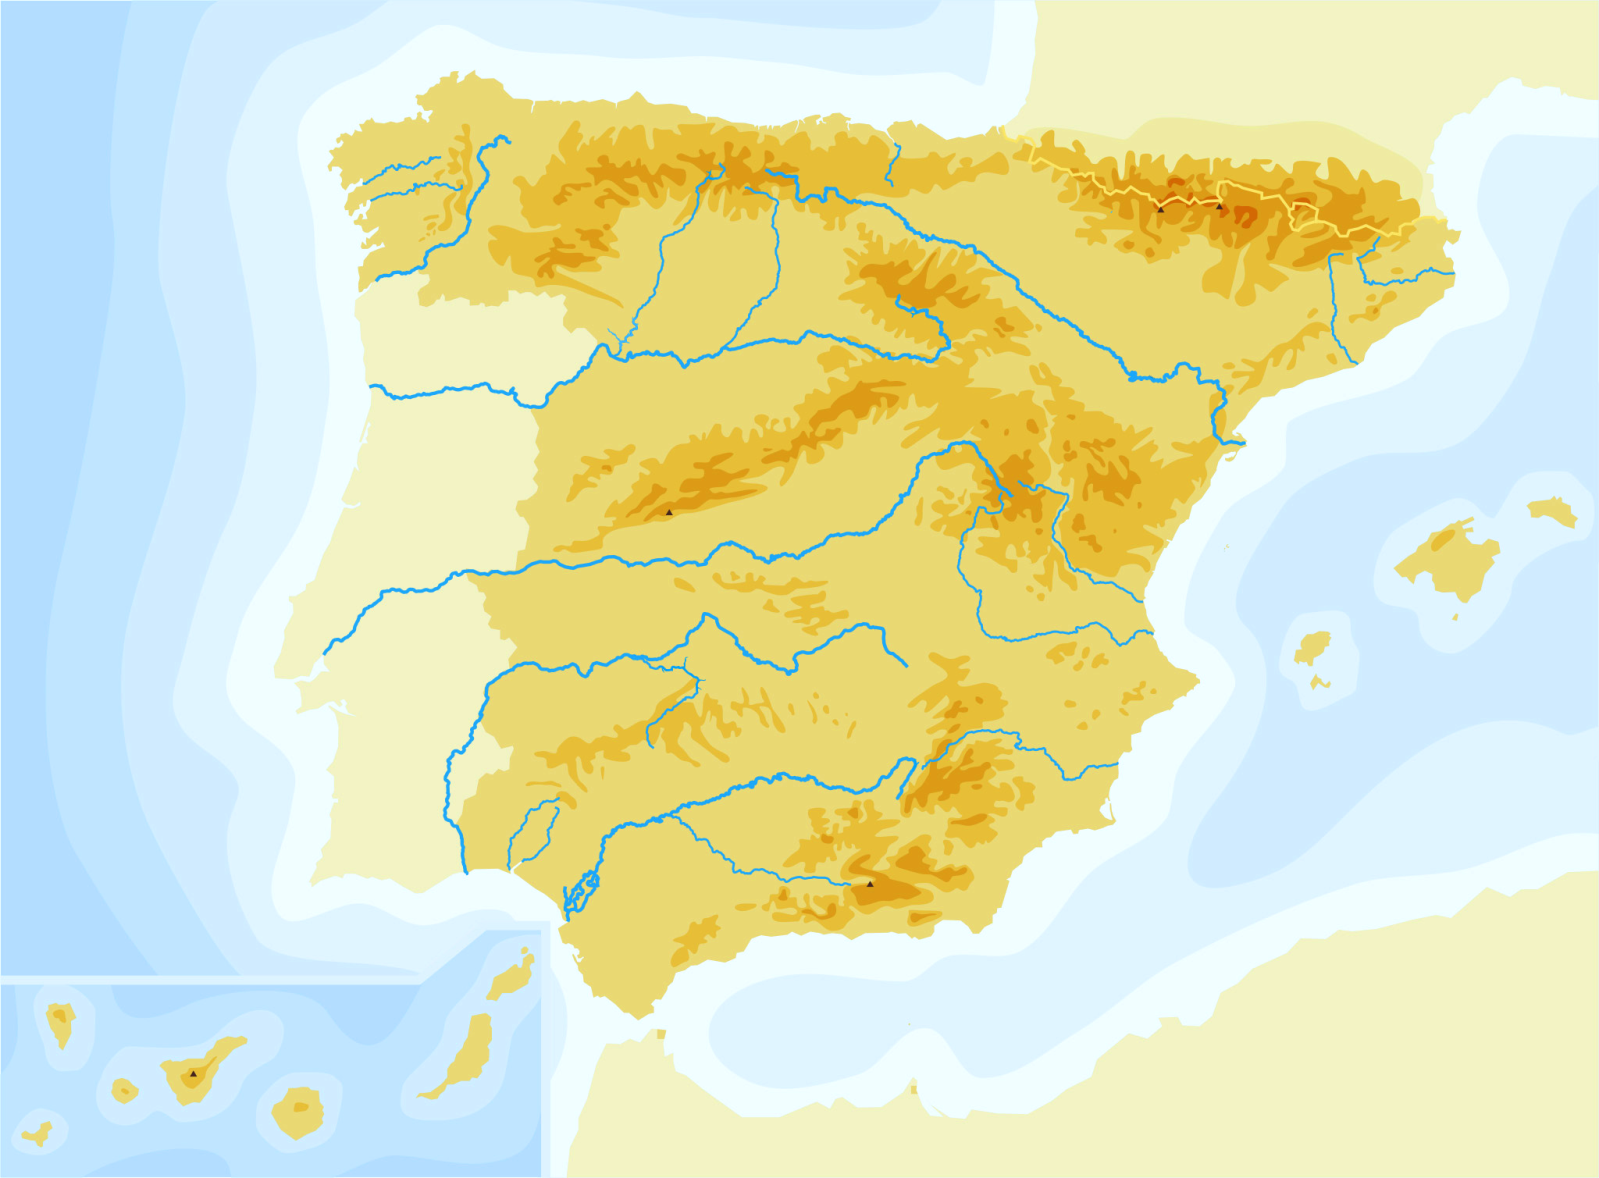 Mapa Picos De España.Juegos De Geografia Juego De Espana Cabos Golfos Bahias